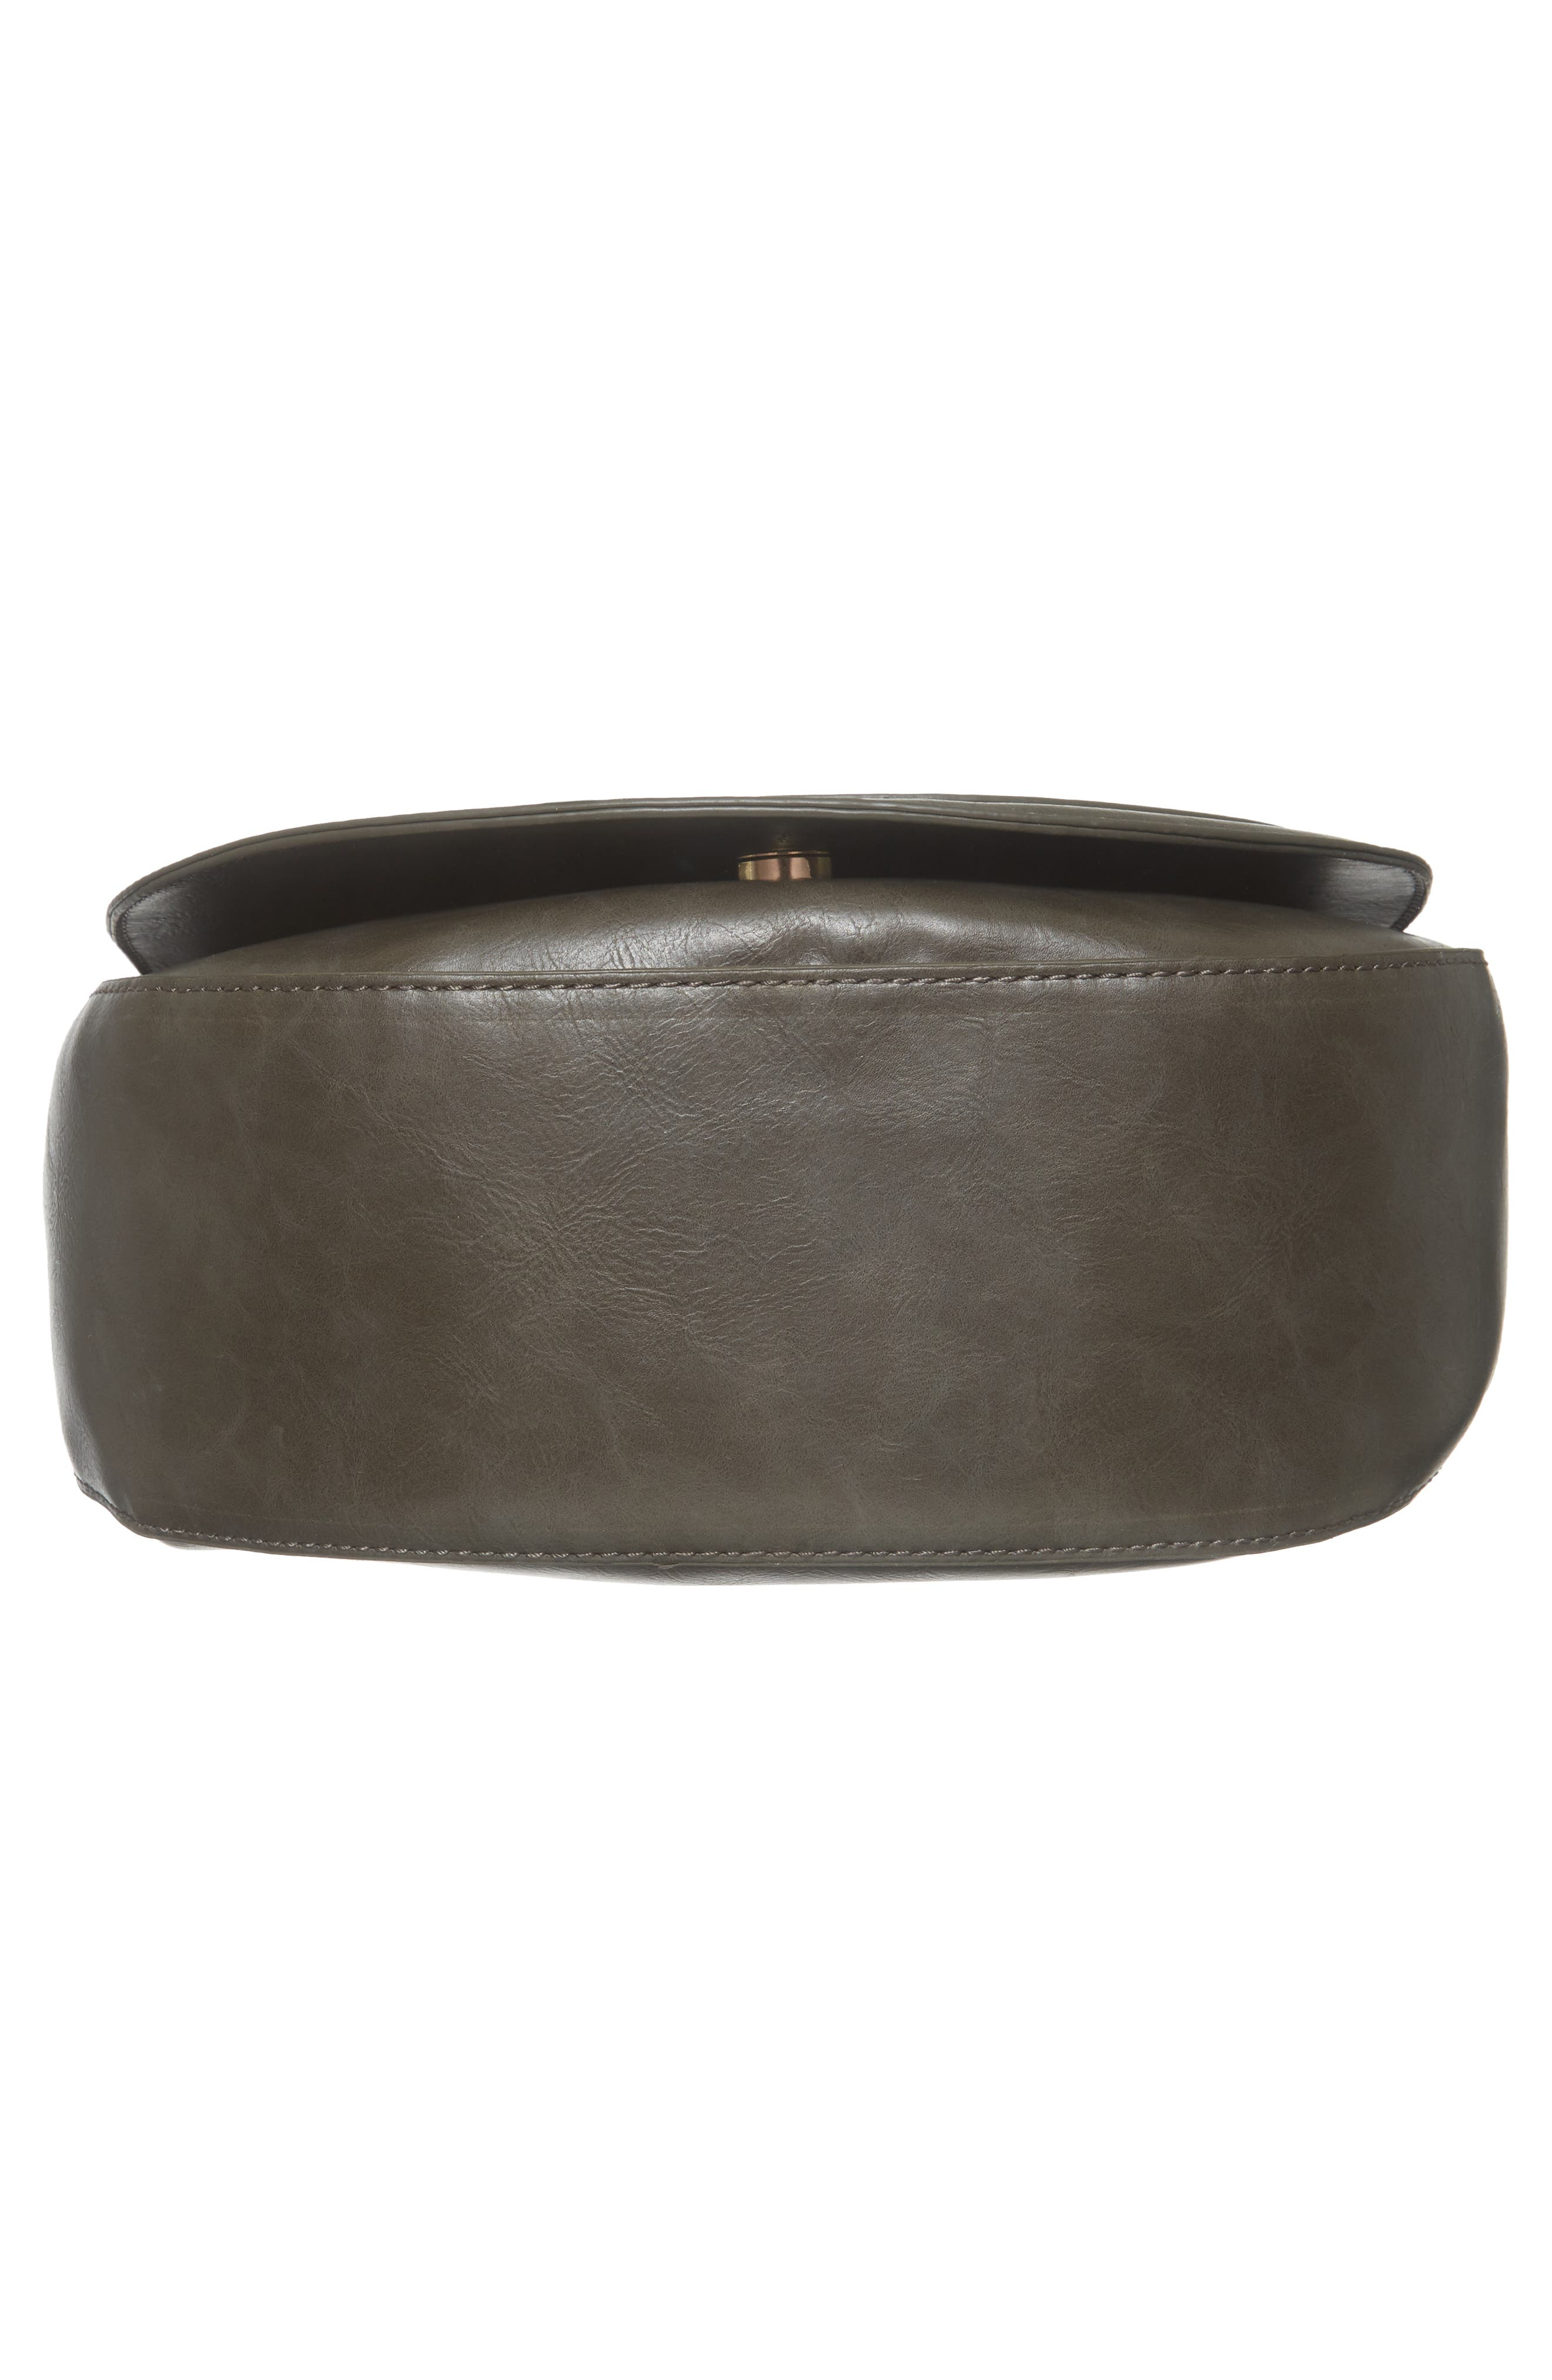 Piri Faux Leather Saddle Bag,                             Alternate thumbnail 17, color,